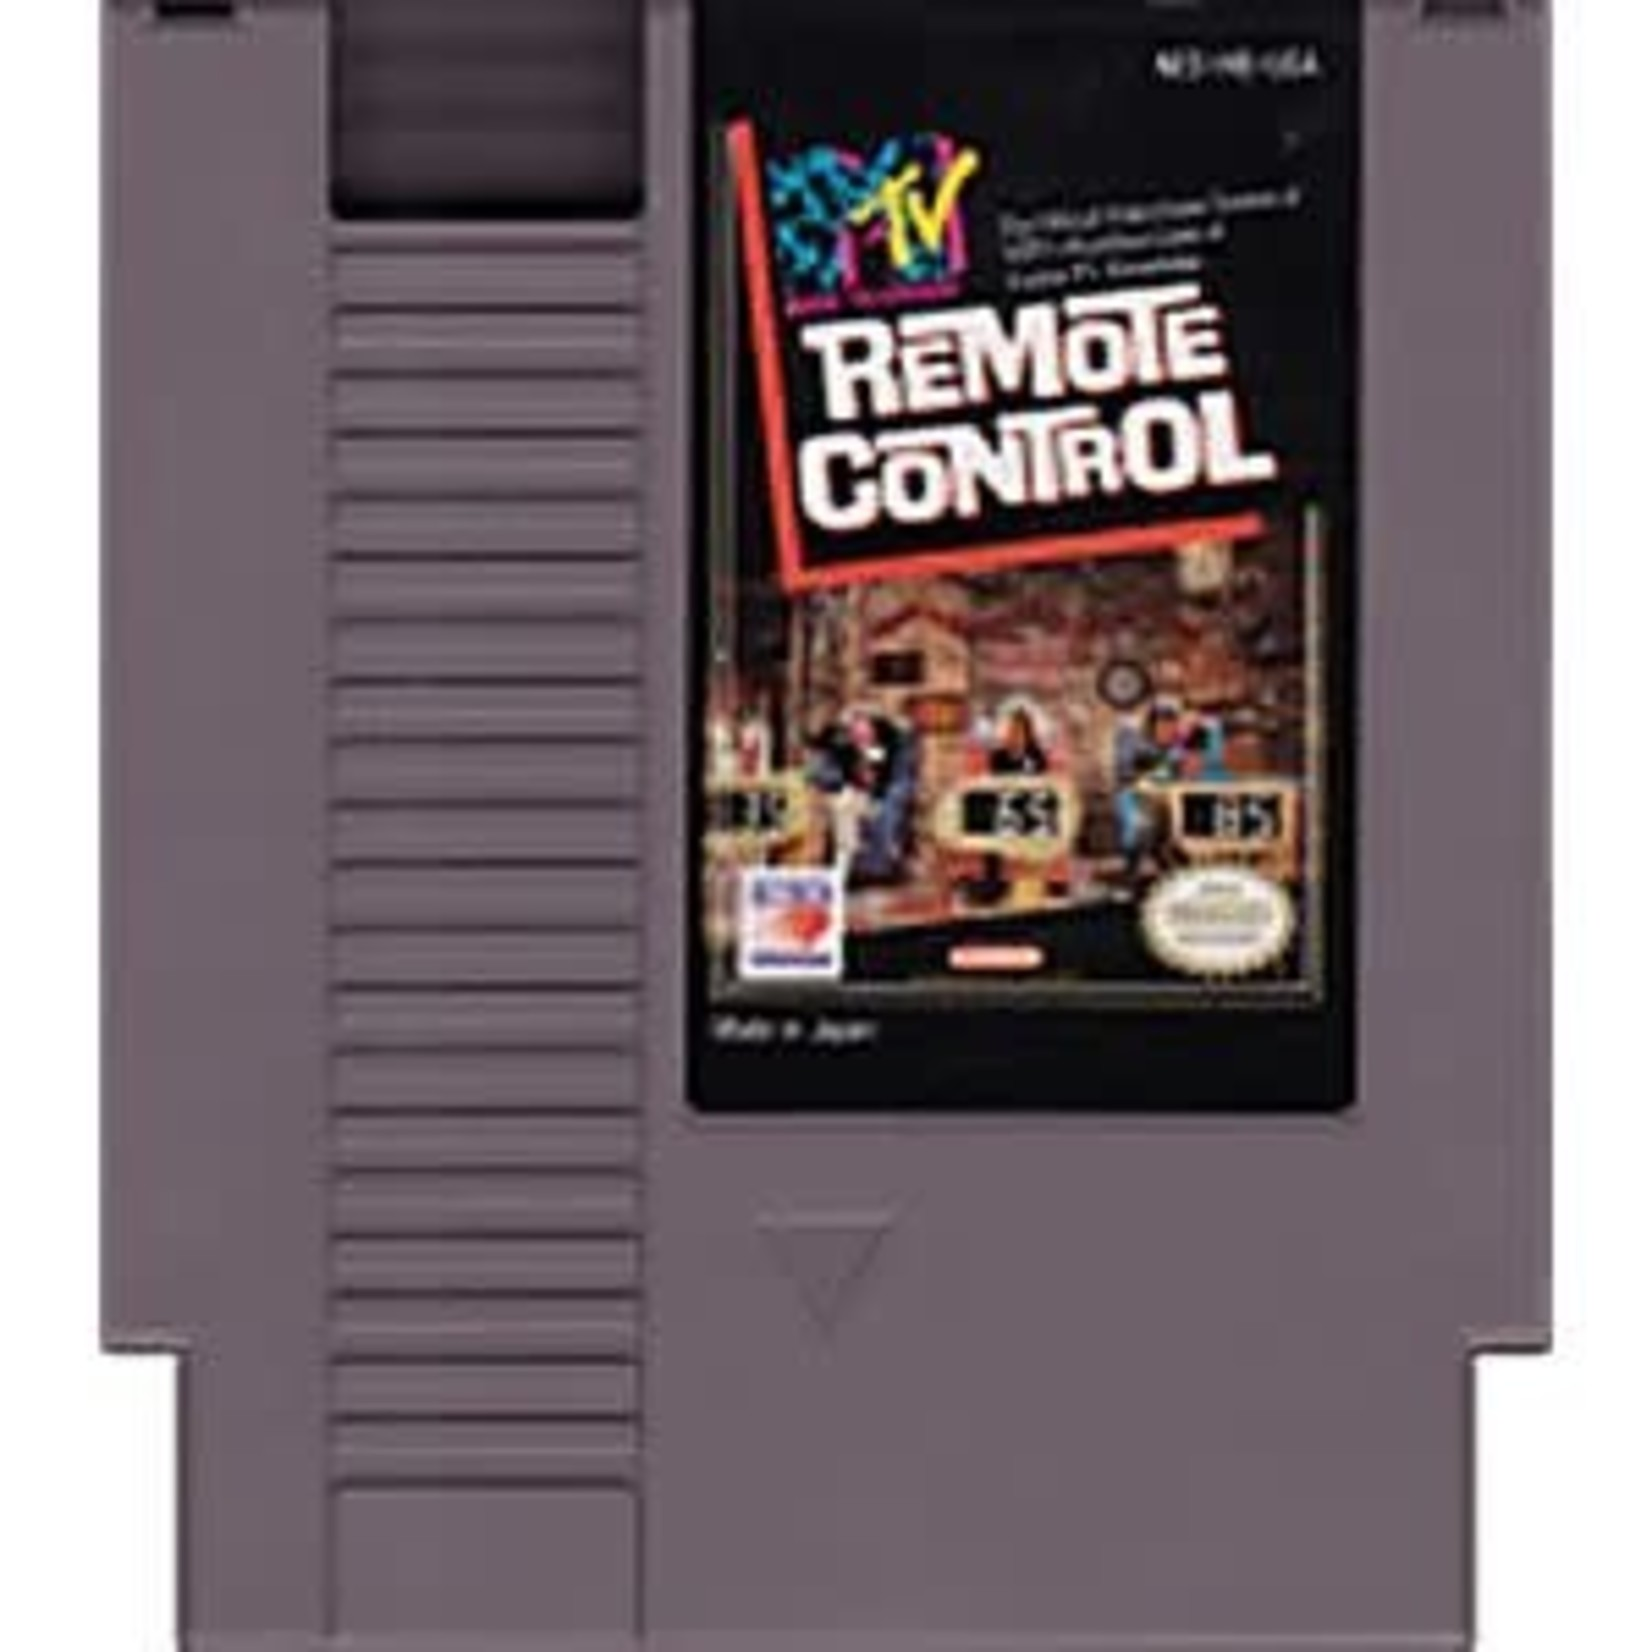 NESU-REMOTE CONTROL (cartridge)